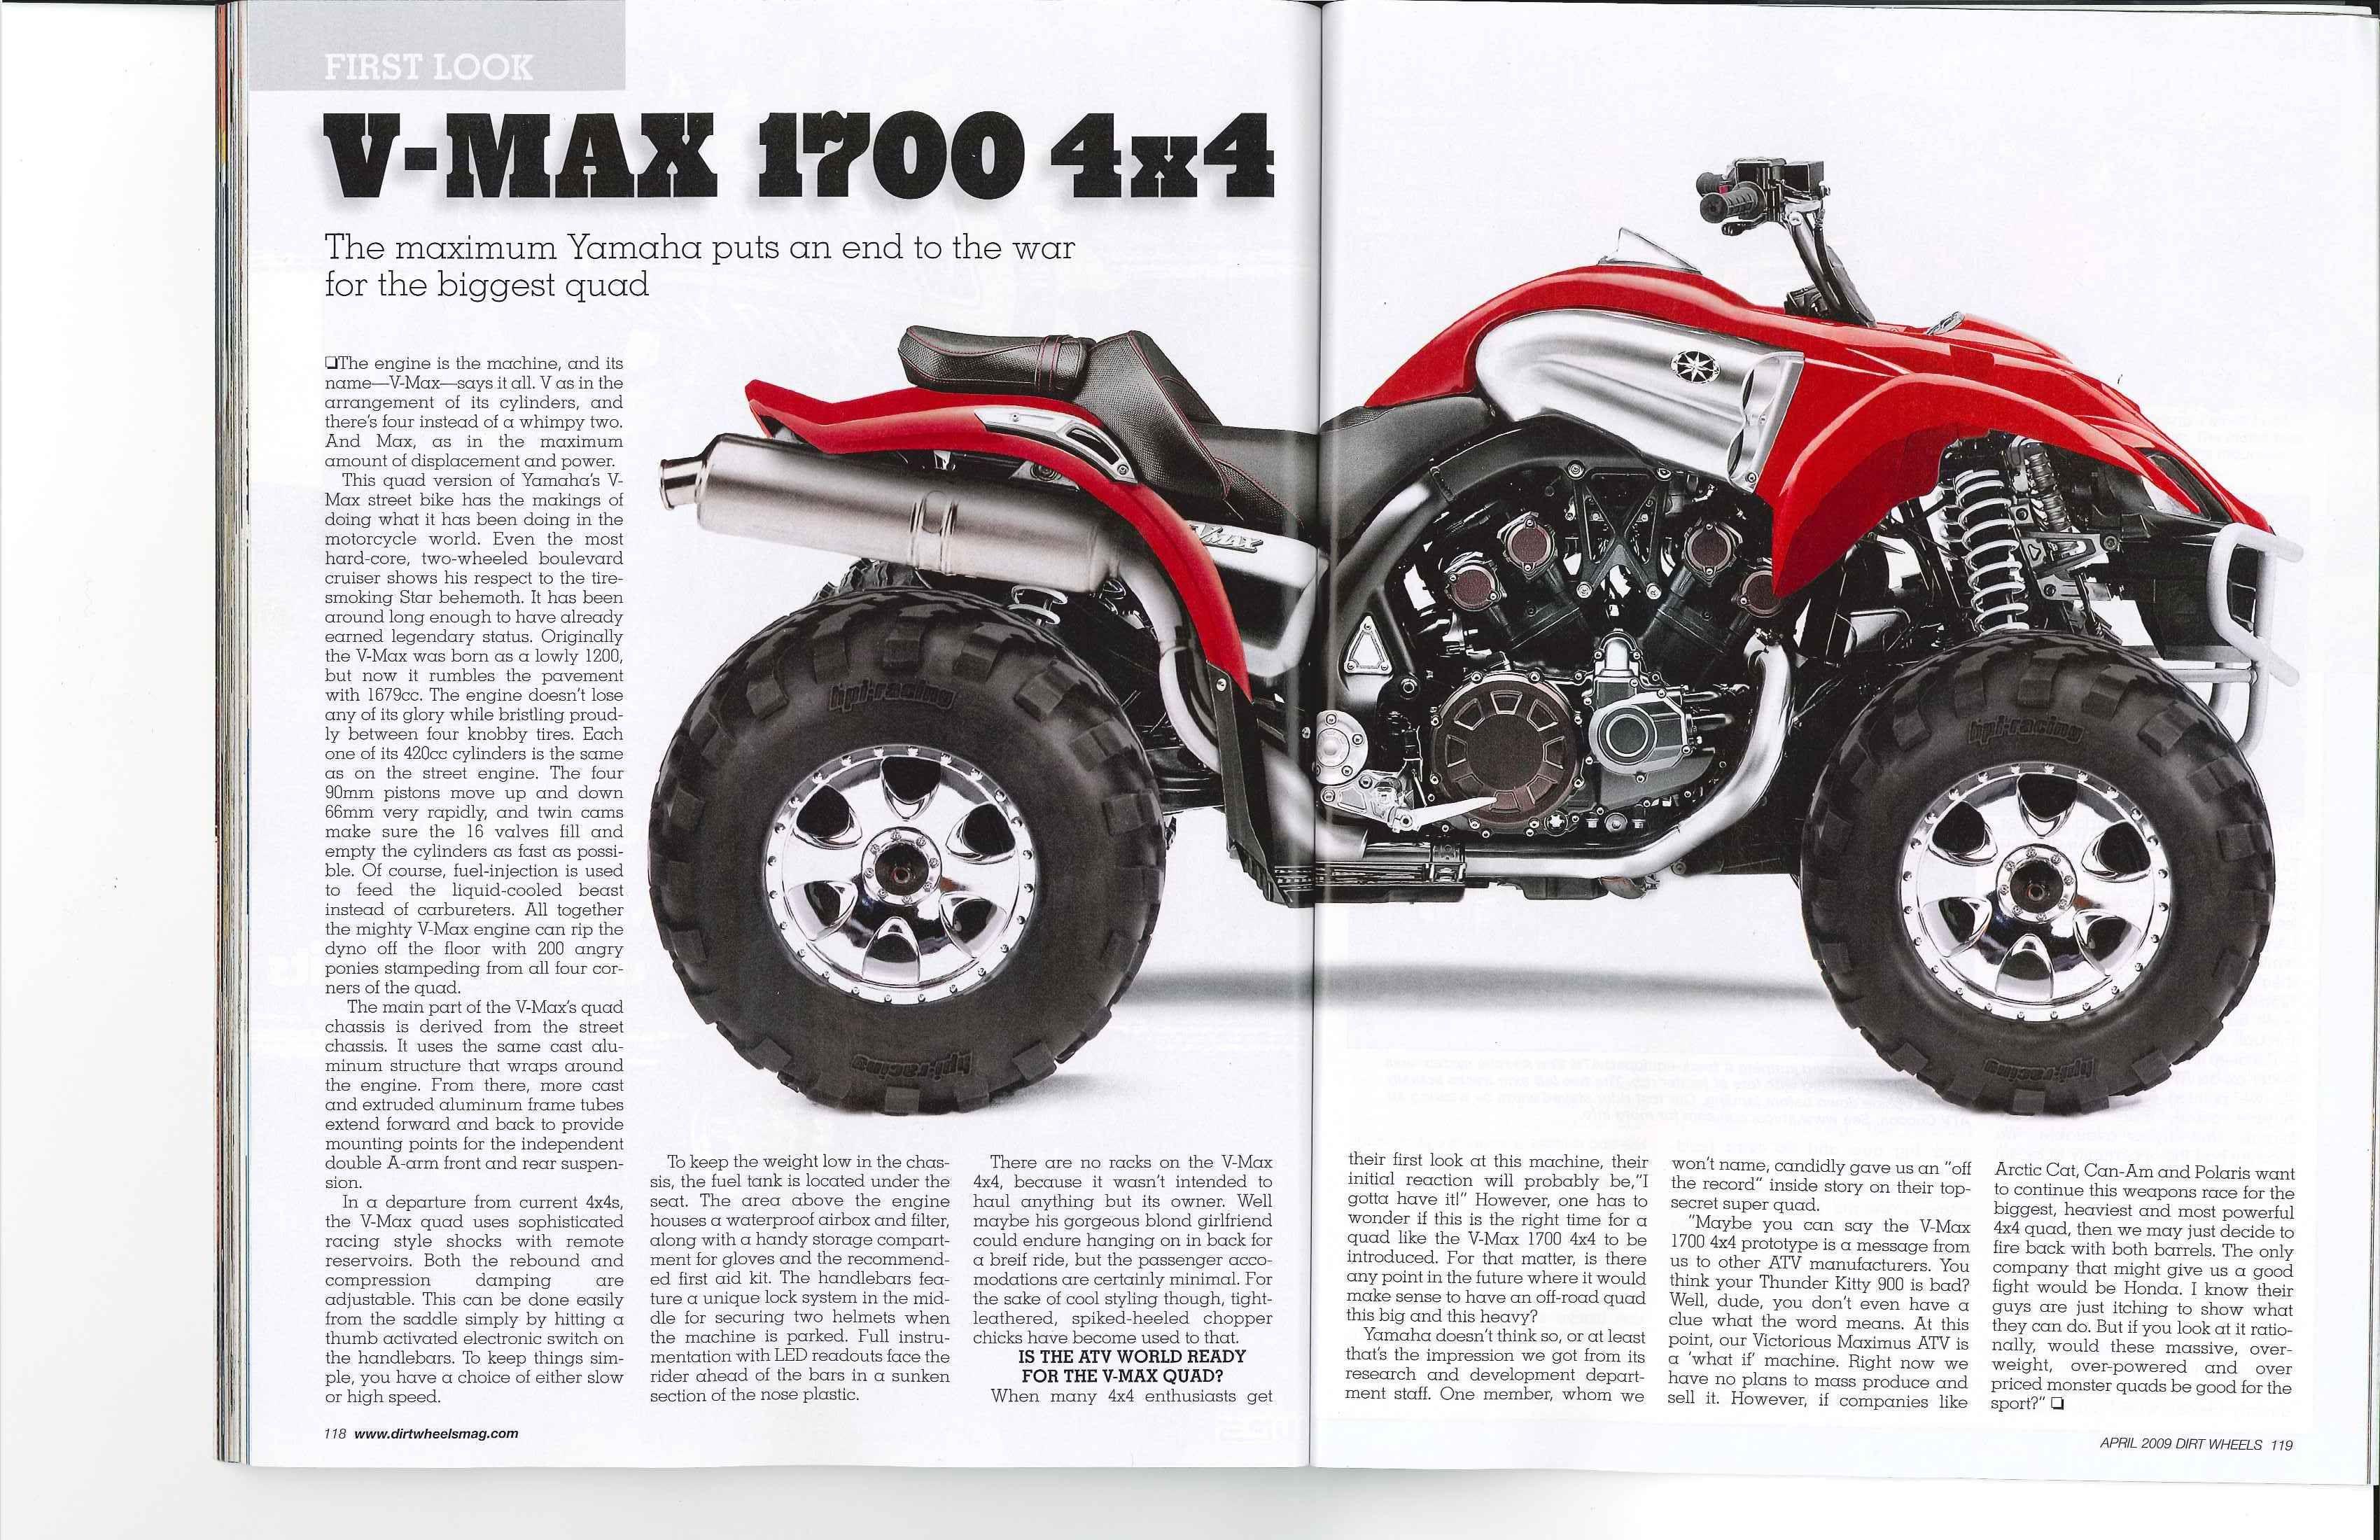 Concept utv 2008 yamaha wolverine 450 special edition